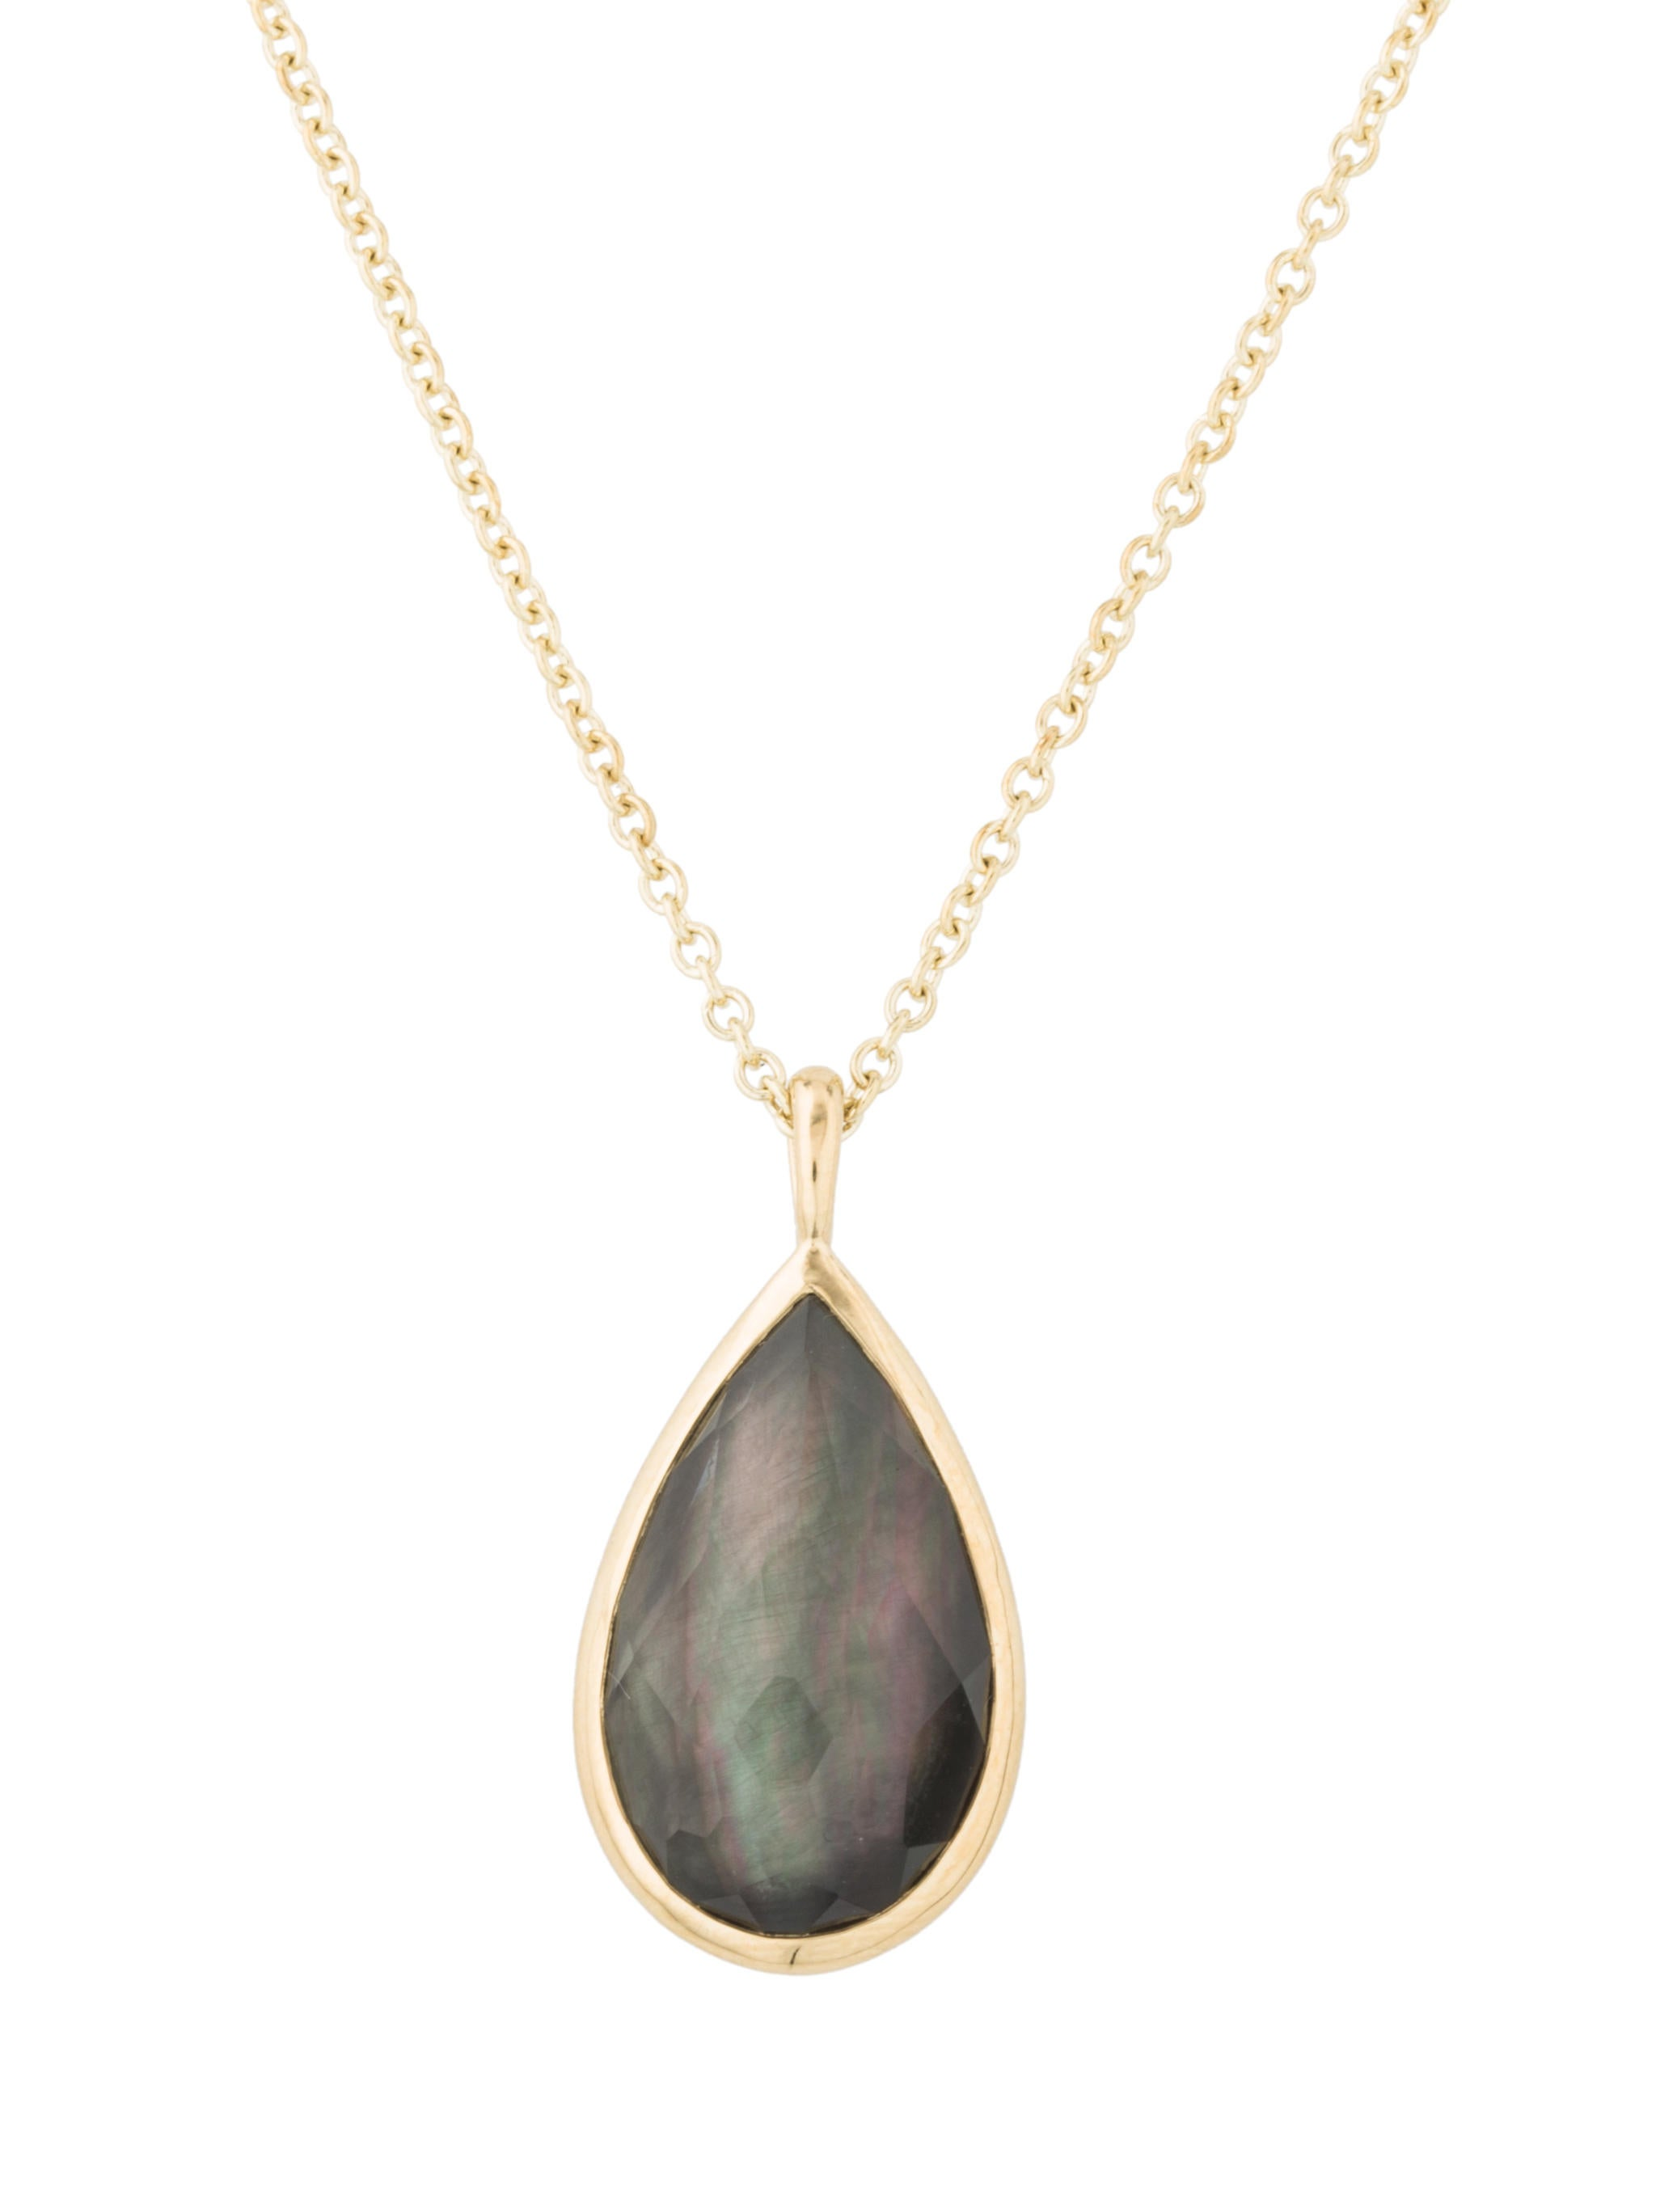 Ippolita 18k Rock Candy Medium Teardrop Pendant Necklace SOn5xWV